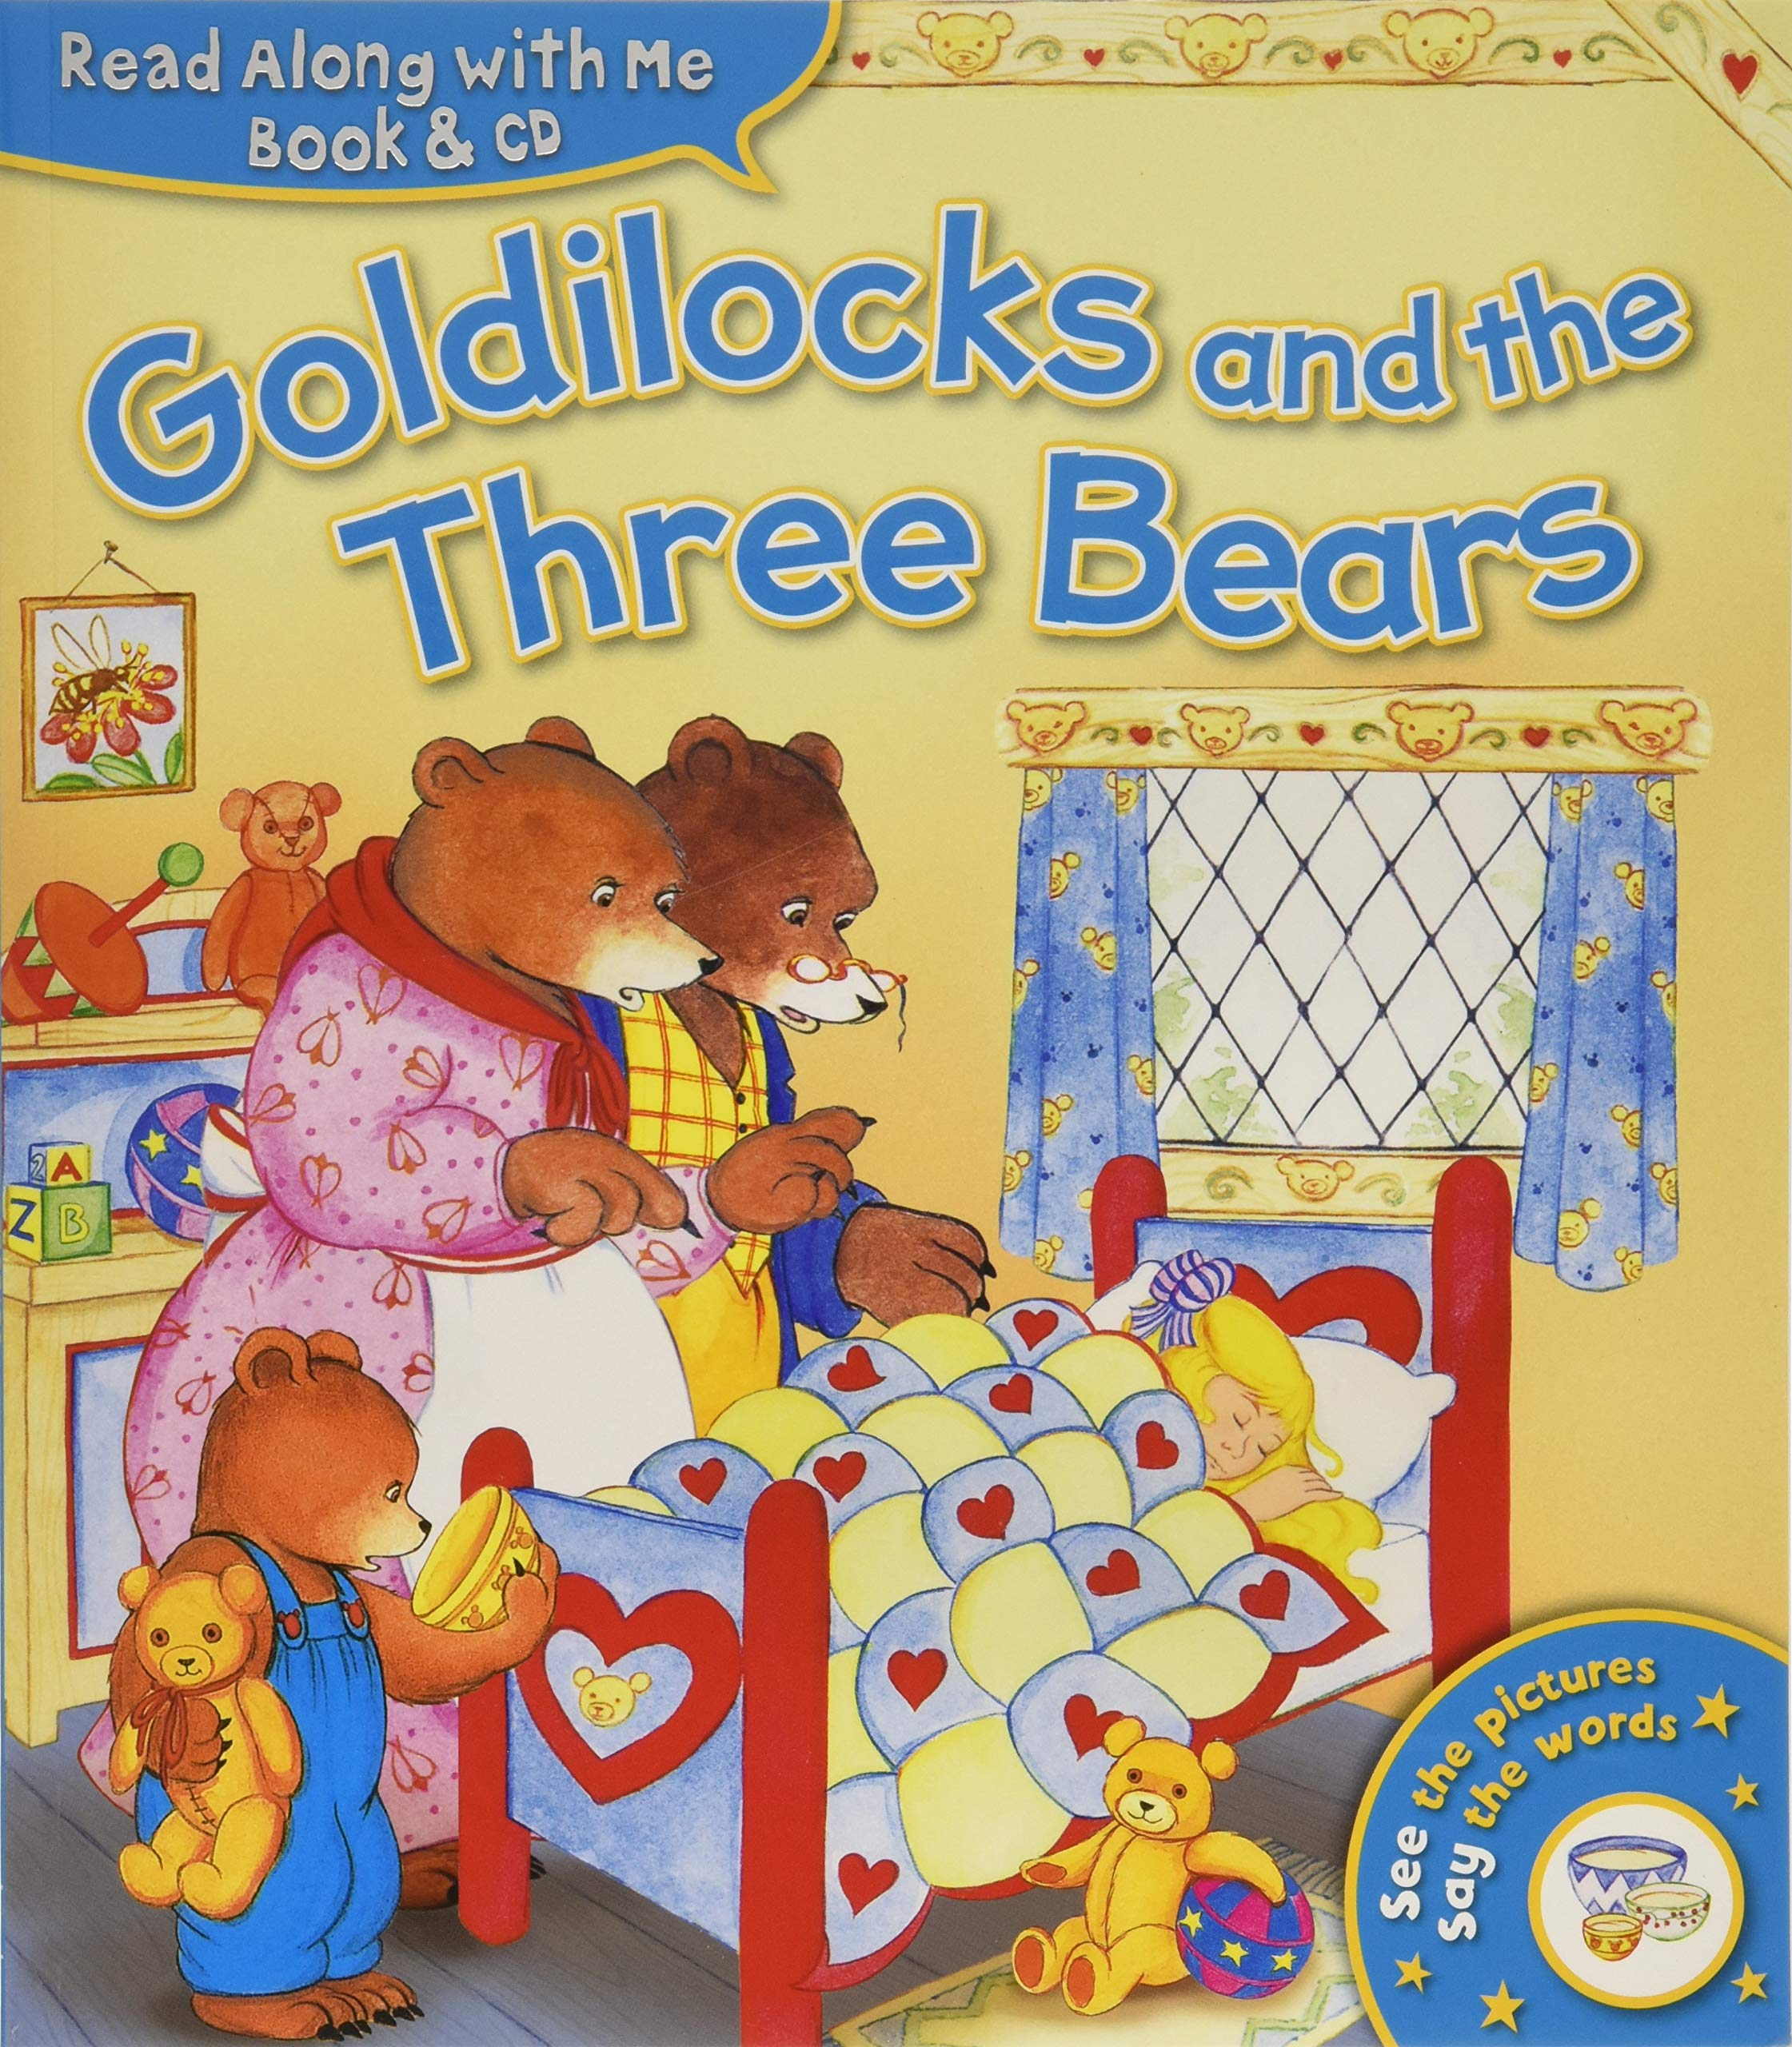 Read Along with Me: Goldilocks and the Three Bears (Book & CD) pdf epub